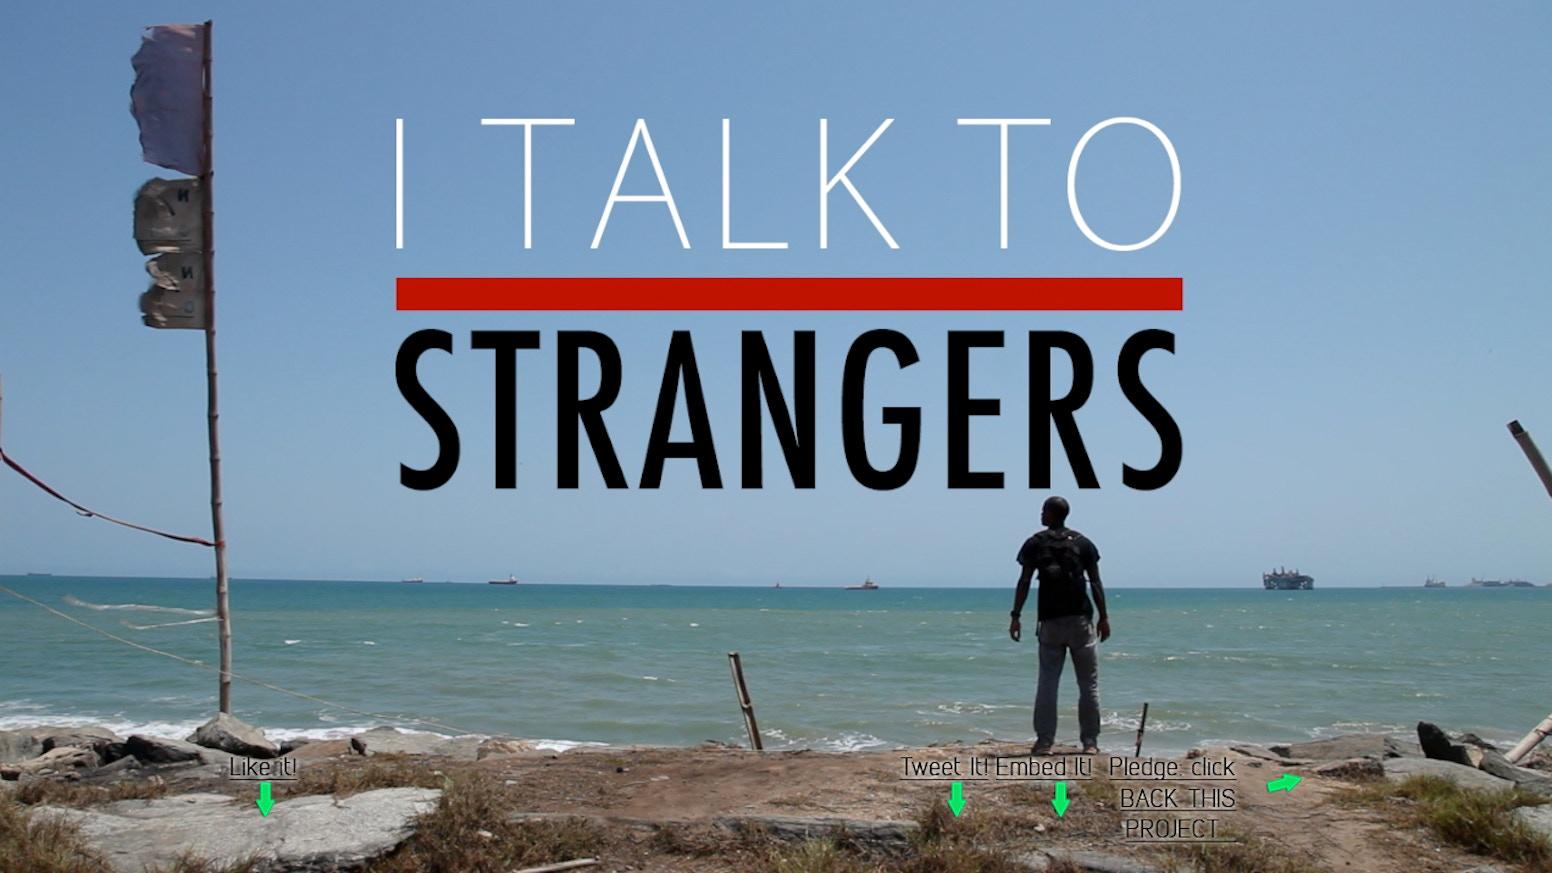 Meet strangers near me